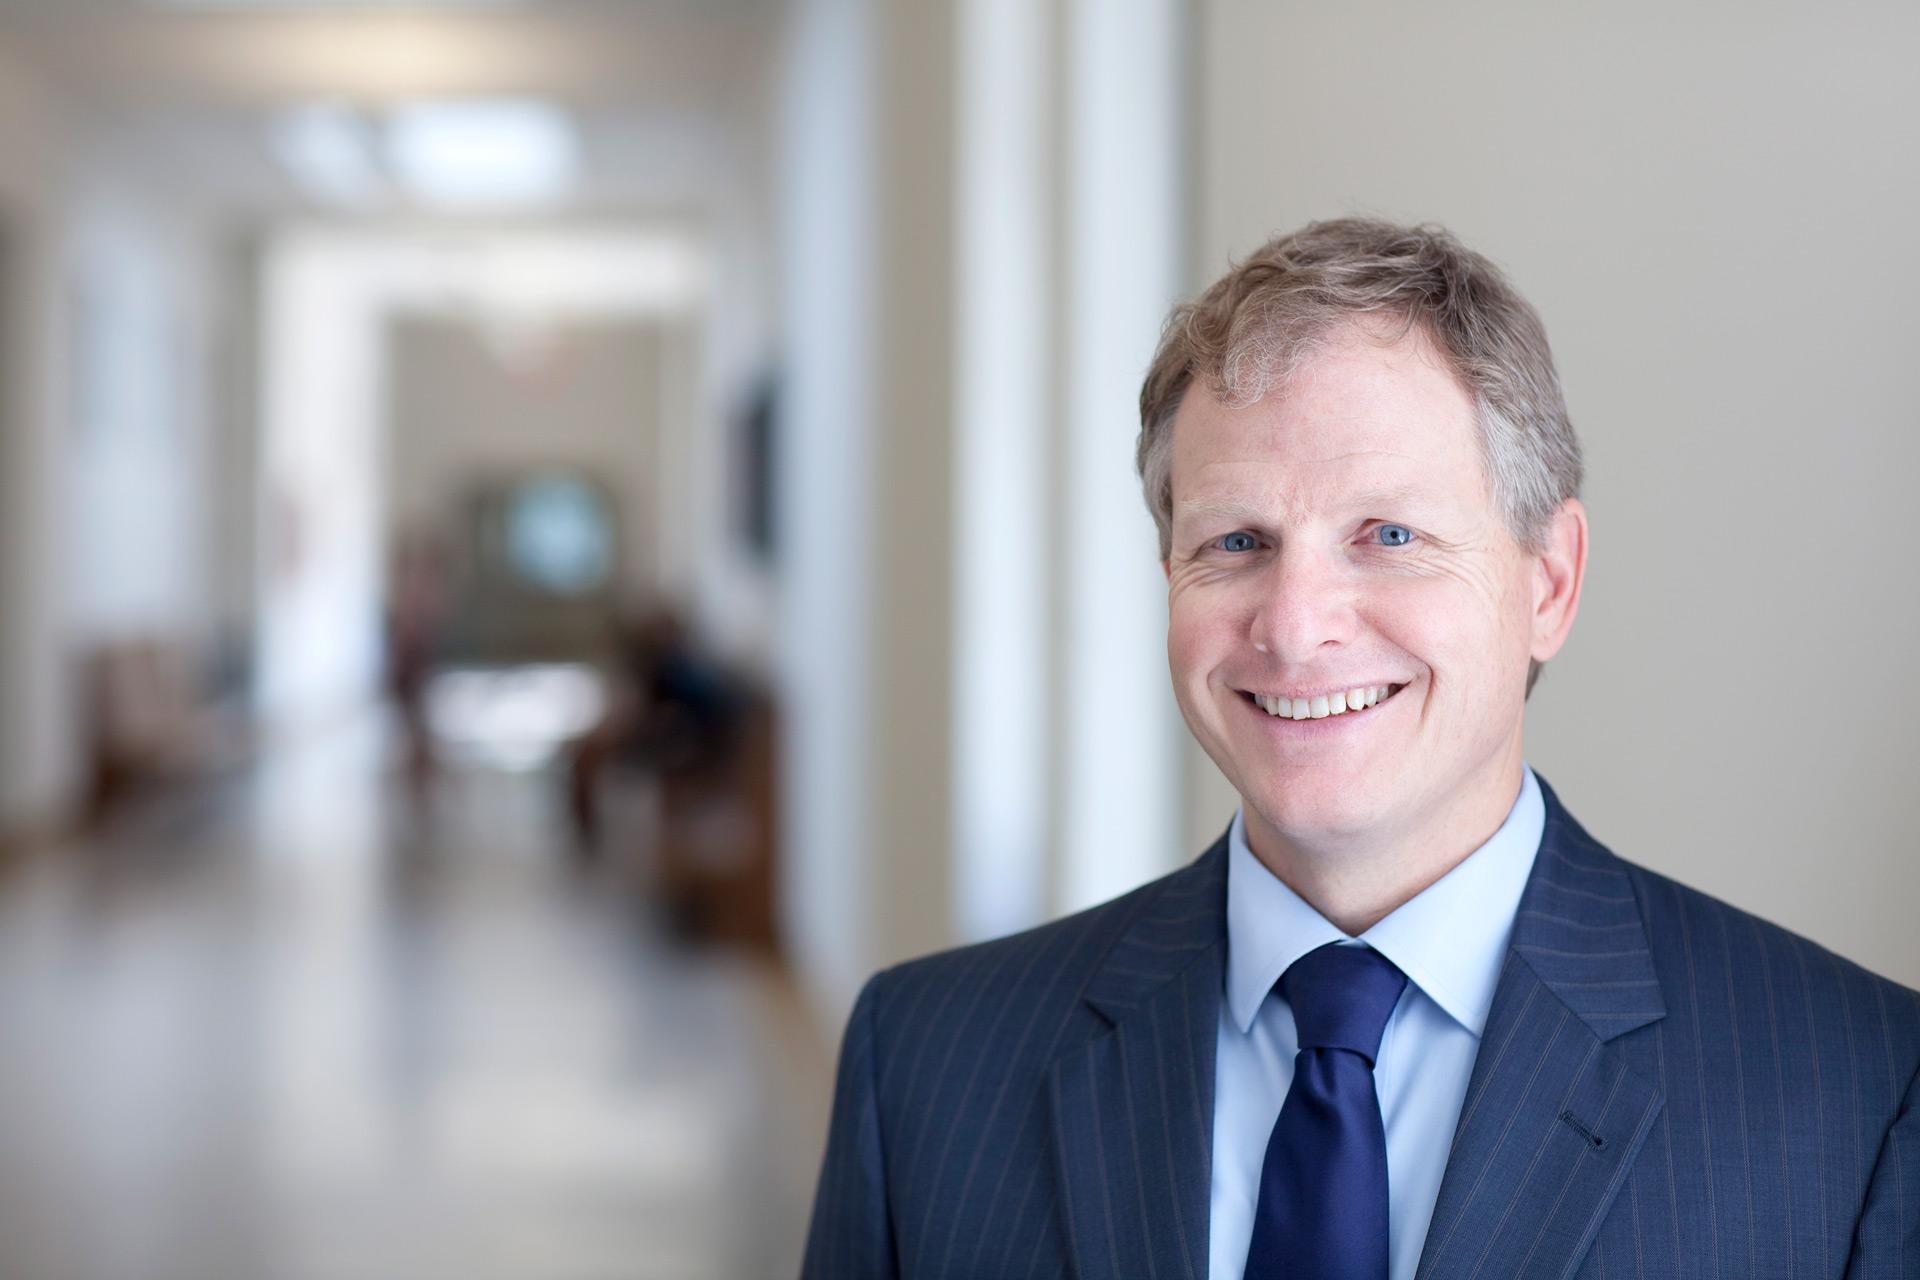 SCAD professor James Lough